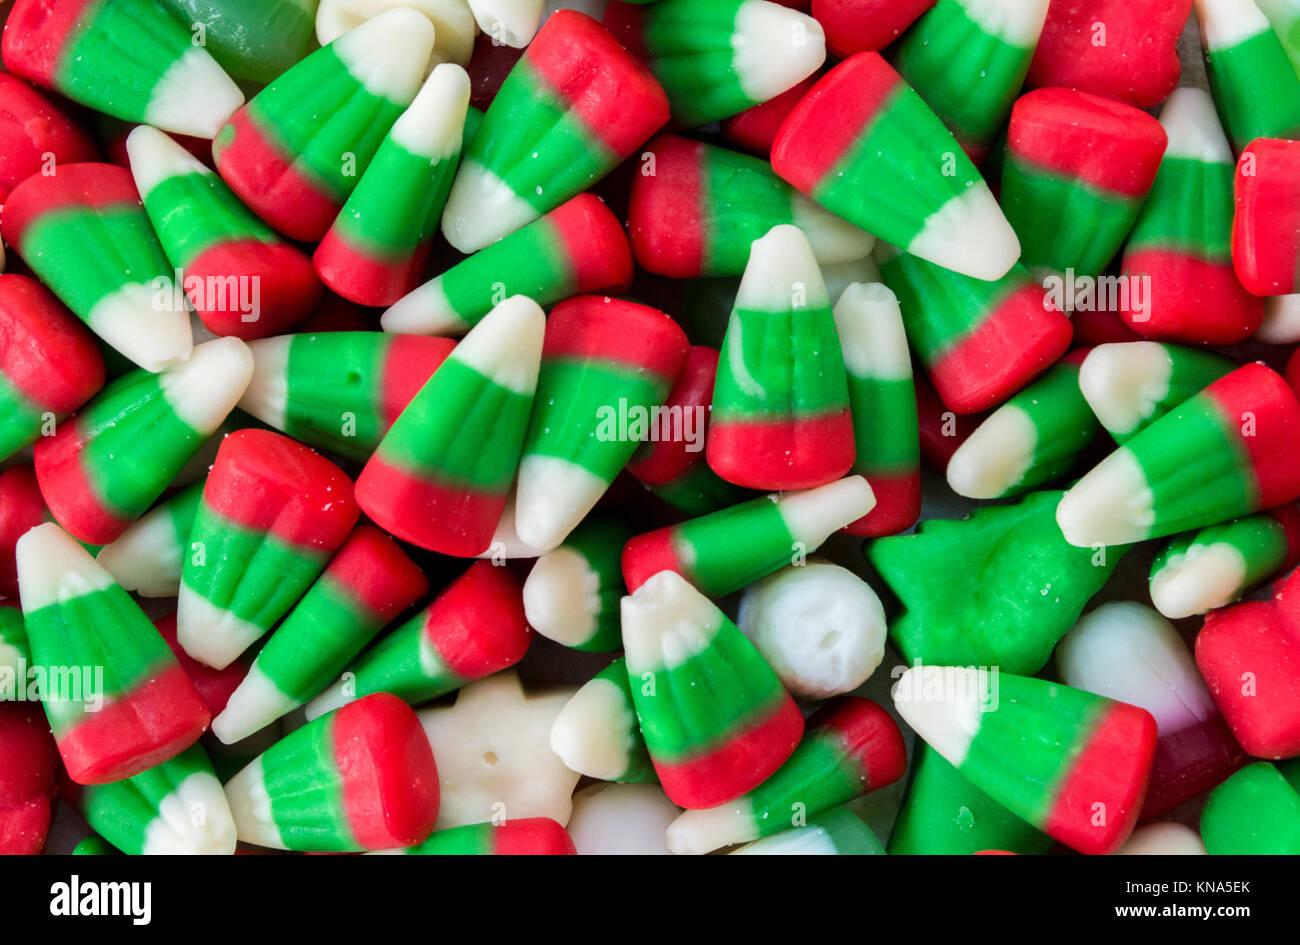 Green Christmas Wallpaper Stock Photos Green Christmas Wallpaper